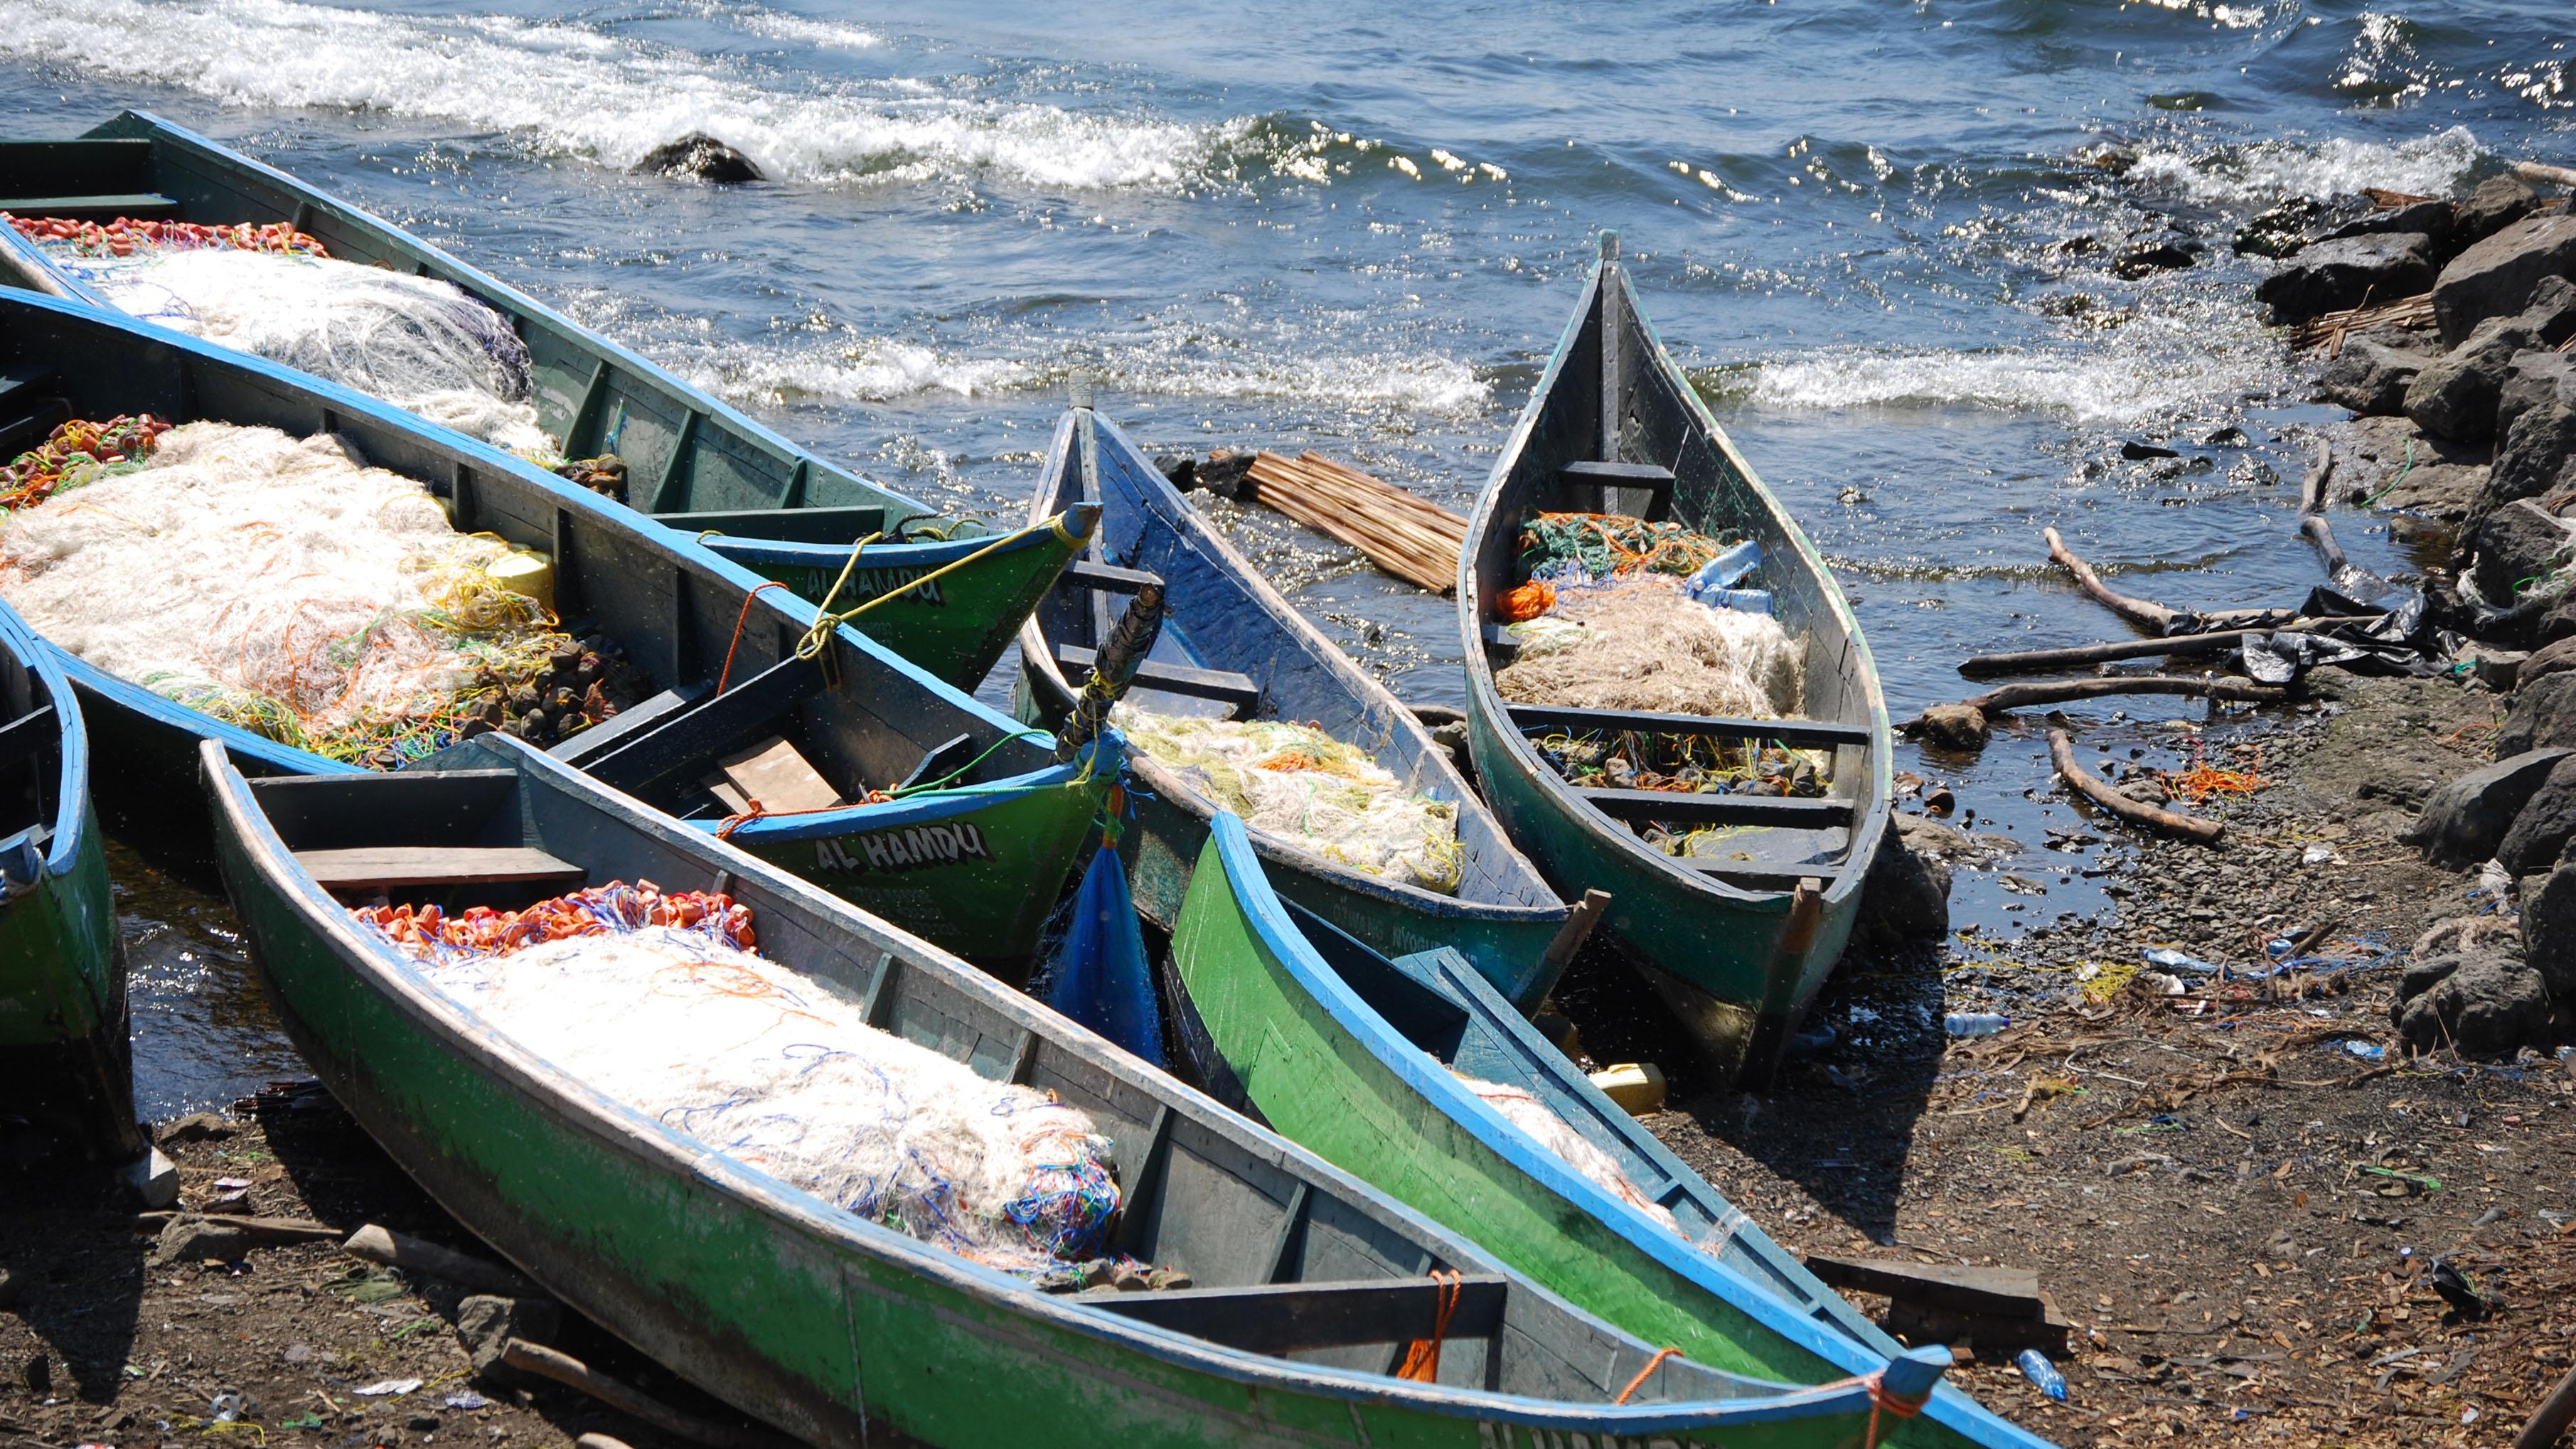 Fishing boats in Lake Victoria, Kenya